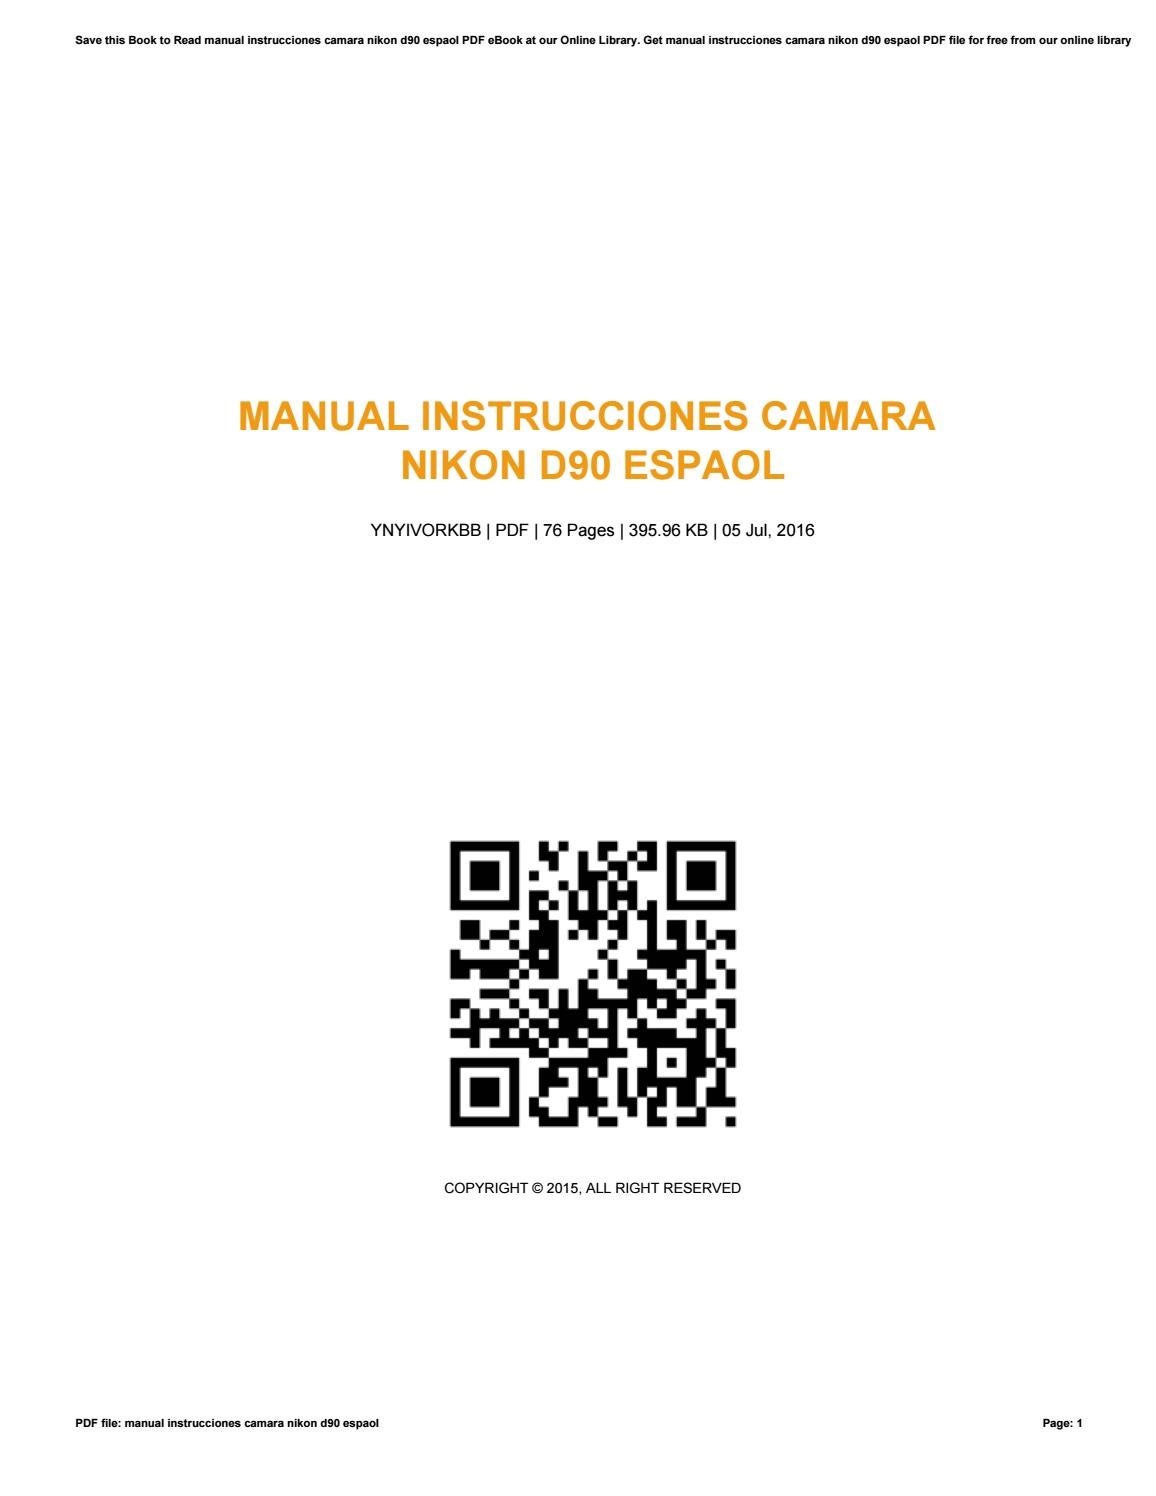 Manual instrucciones camara nikon d90 espaol by